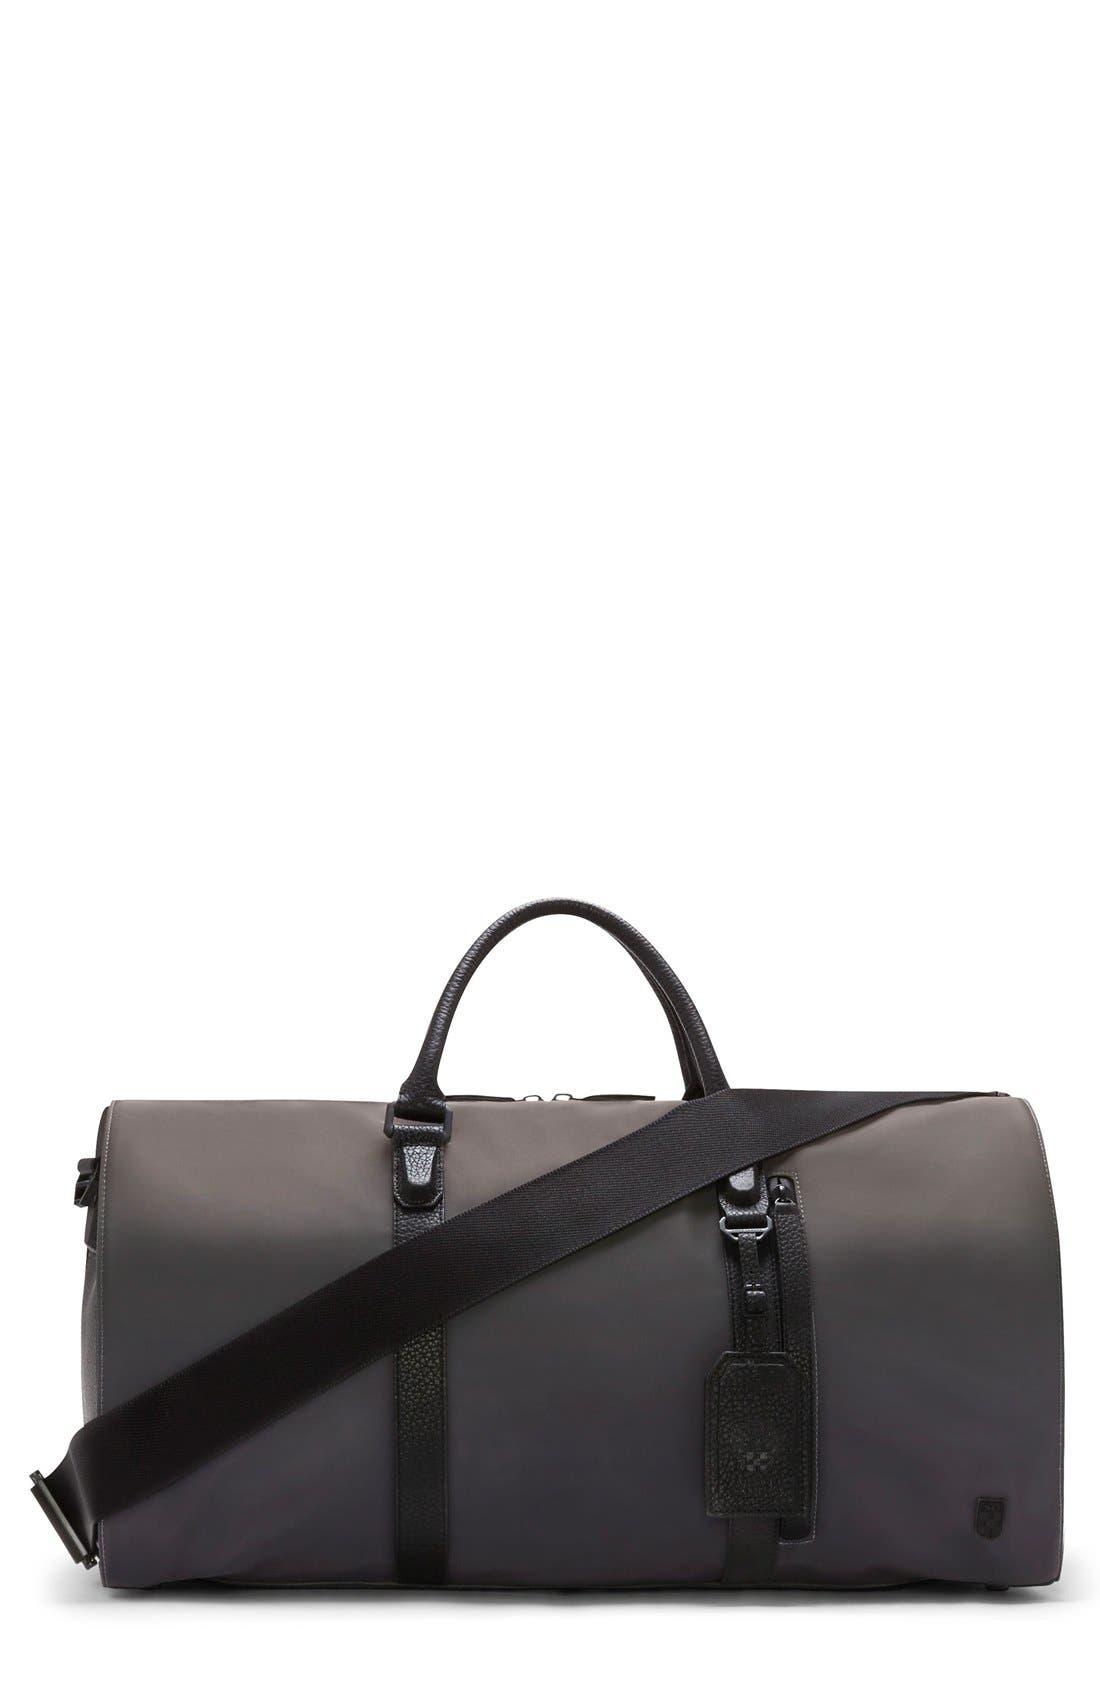 VINCE CAMUTO 'Cutro' Duffel Bag